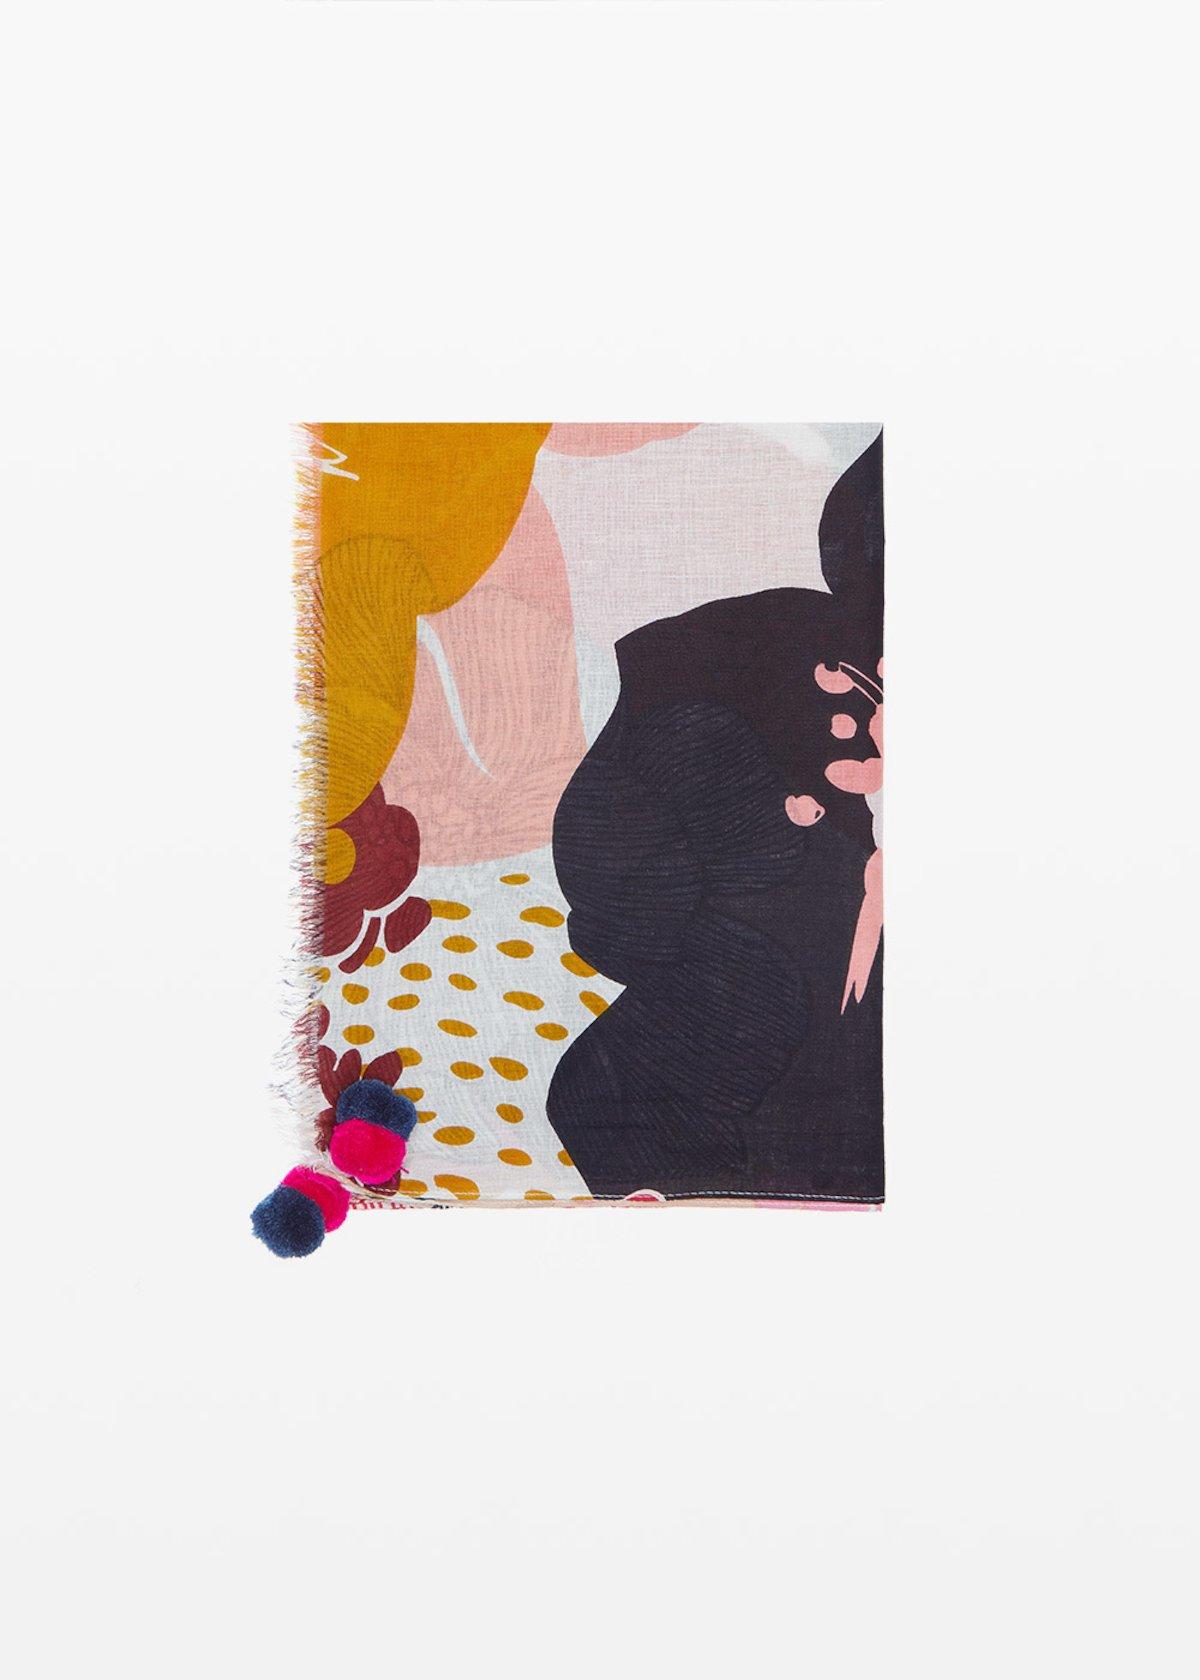 Sciarpa Shay con macro fantasia floreale - White / Kiwi Fantasia - Donna - Immagine categoria